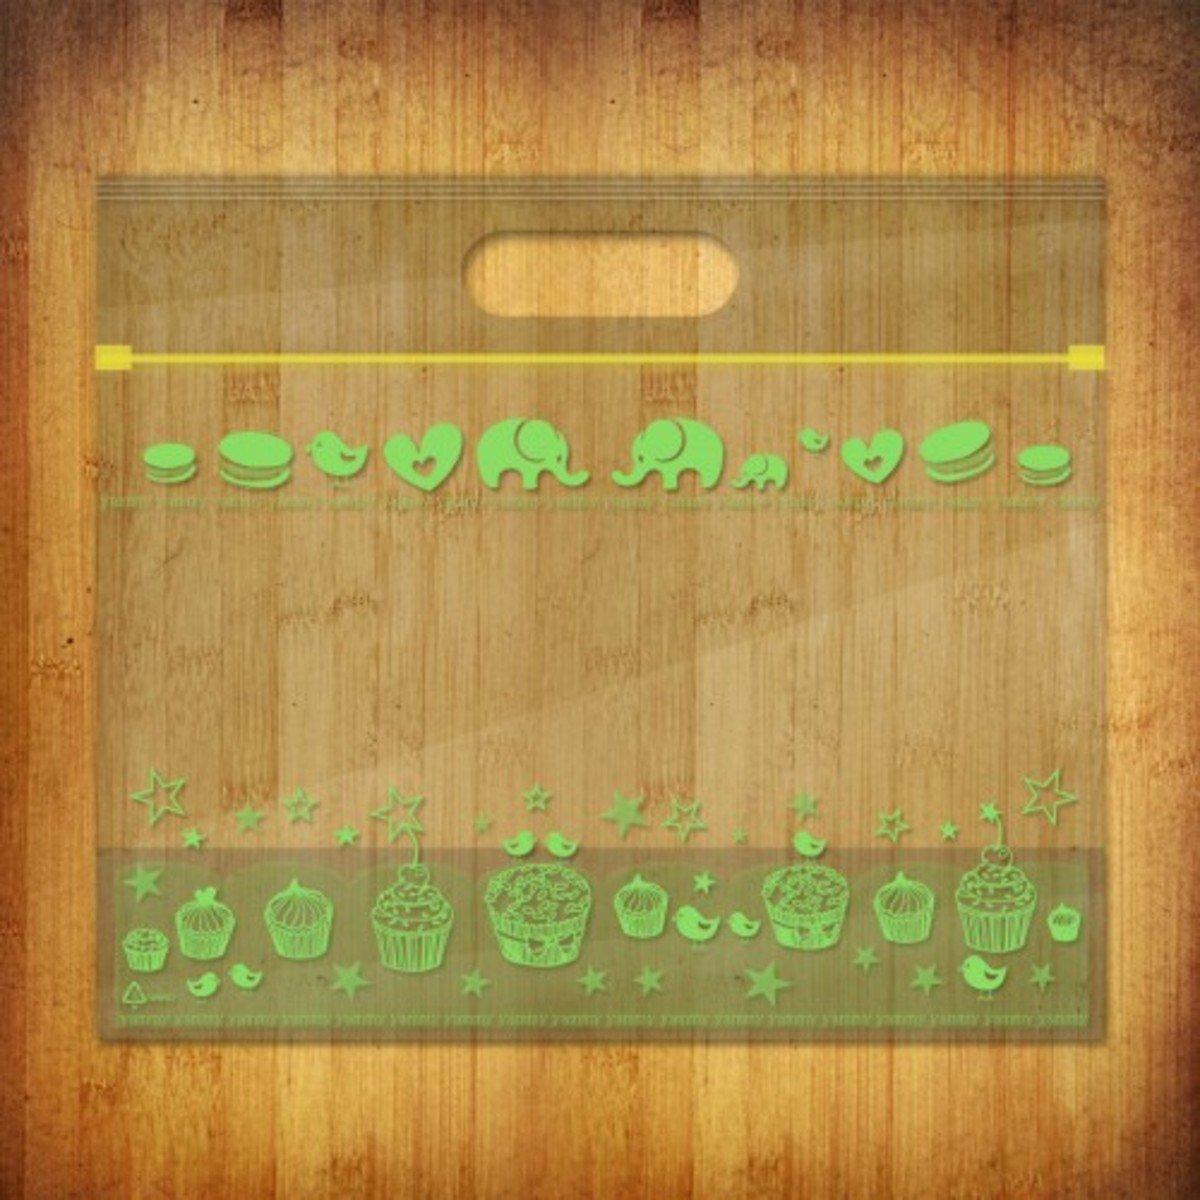 PP夾鏈麵包/食物袋-(雅比美物-綠野仙蹤10個裝)